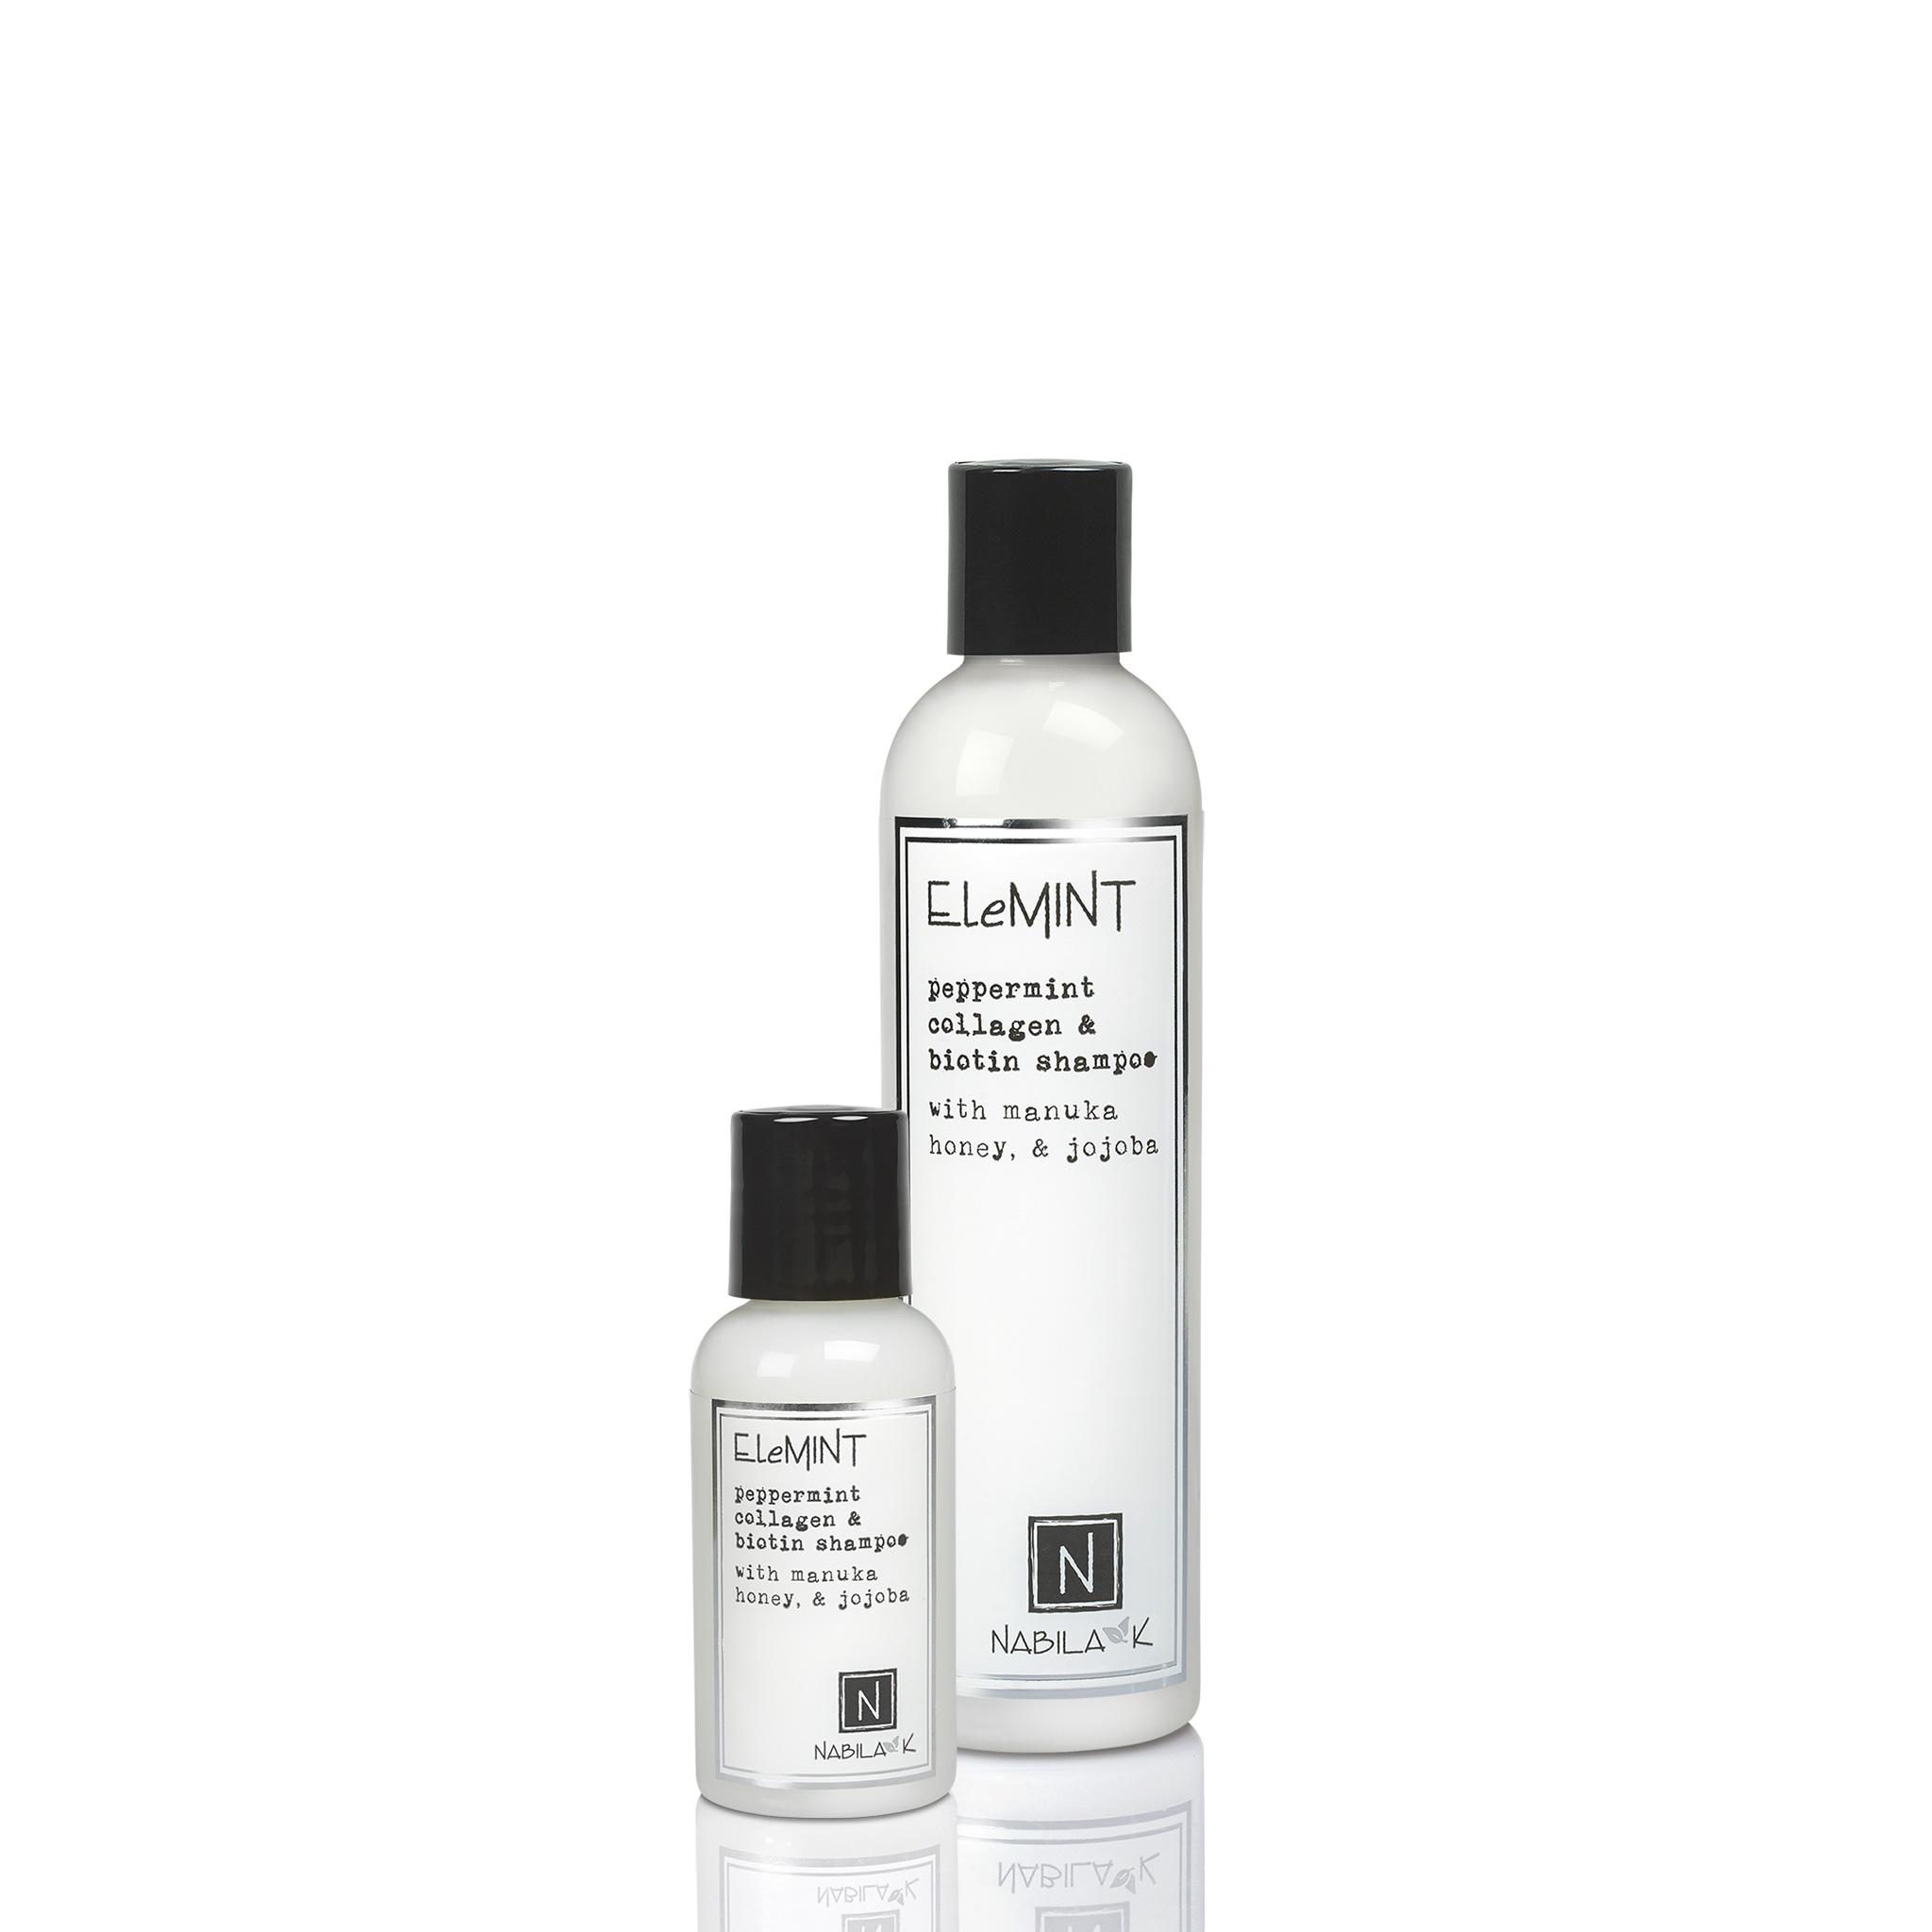 1 Large and Travel Sized Bottle of Elemint Peppermint Collagen and Biotin Shampoo with Manuka Honey and Jojoba